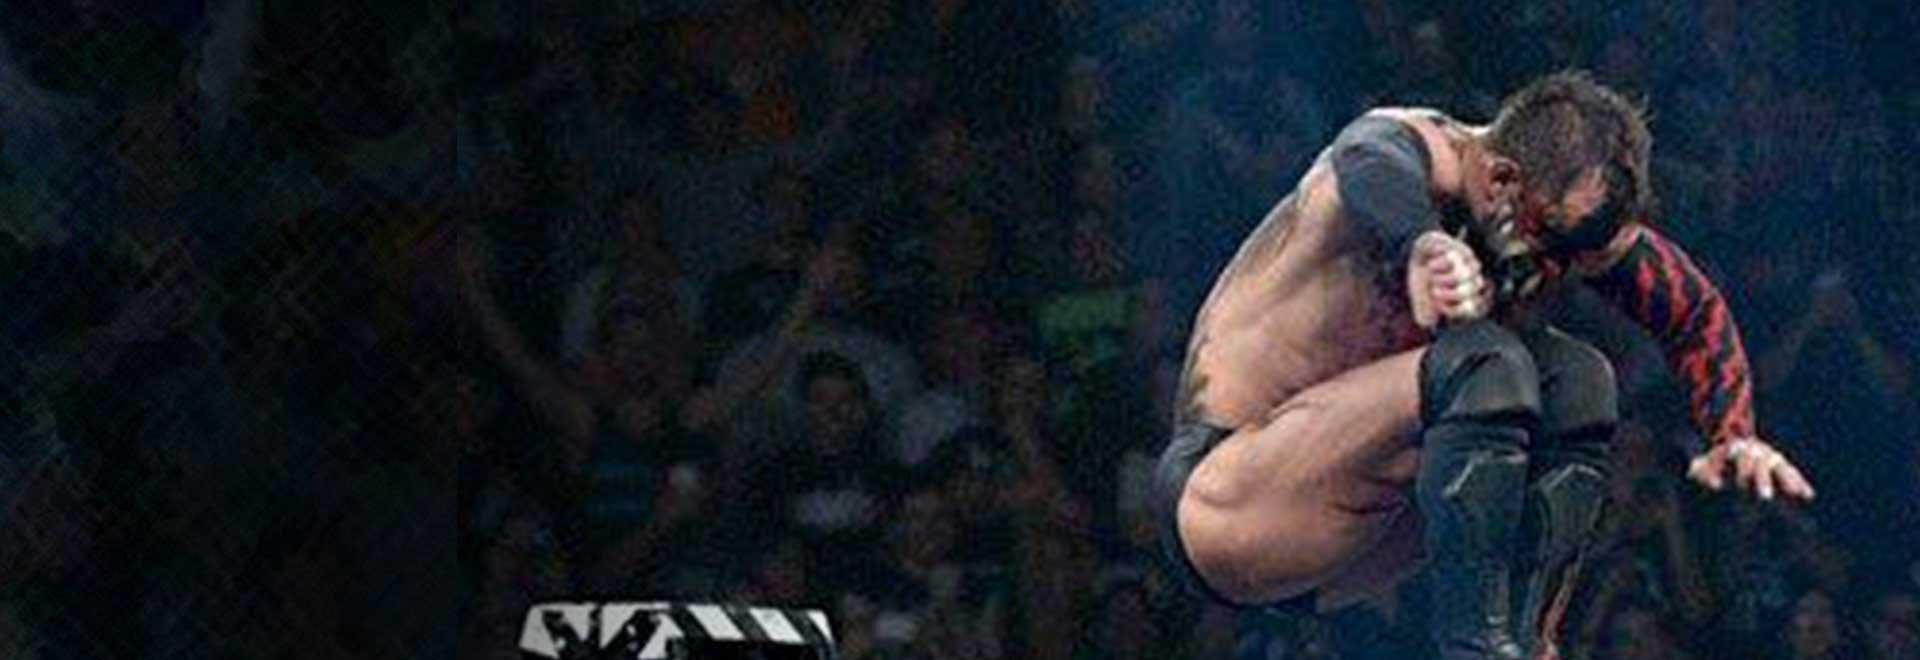 WWE 24 NXT Brooklyn